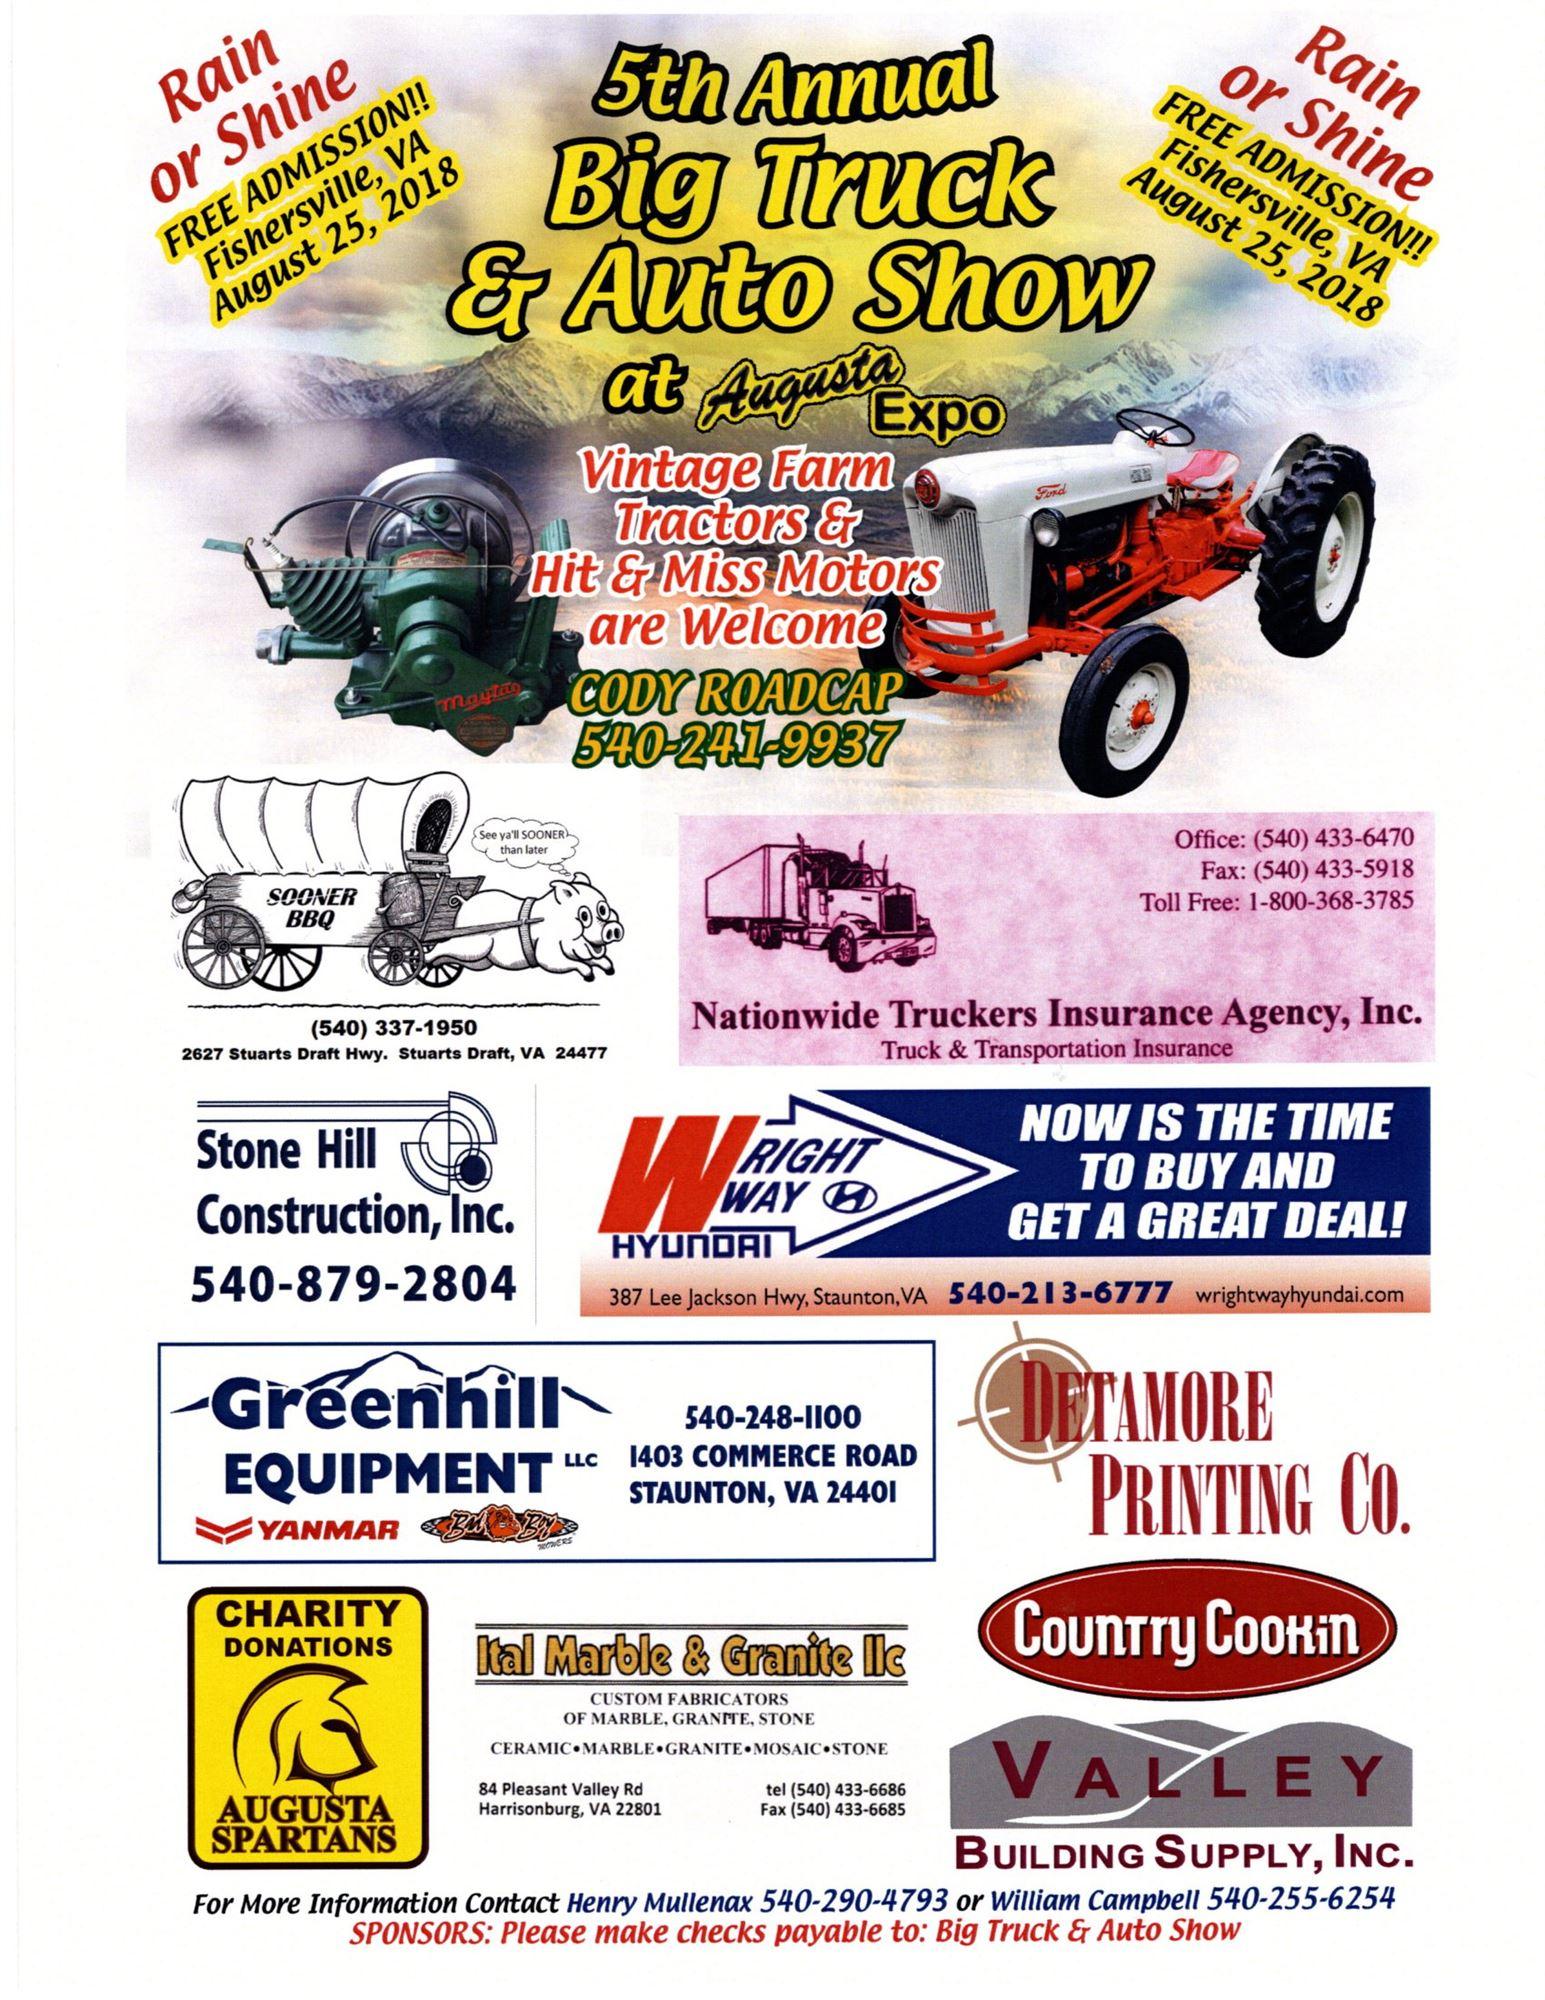 Big Truck Auto Show - Augusta car show